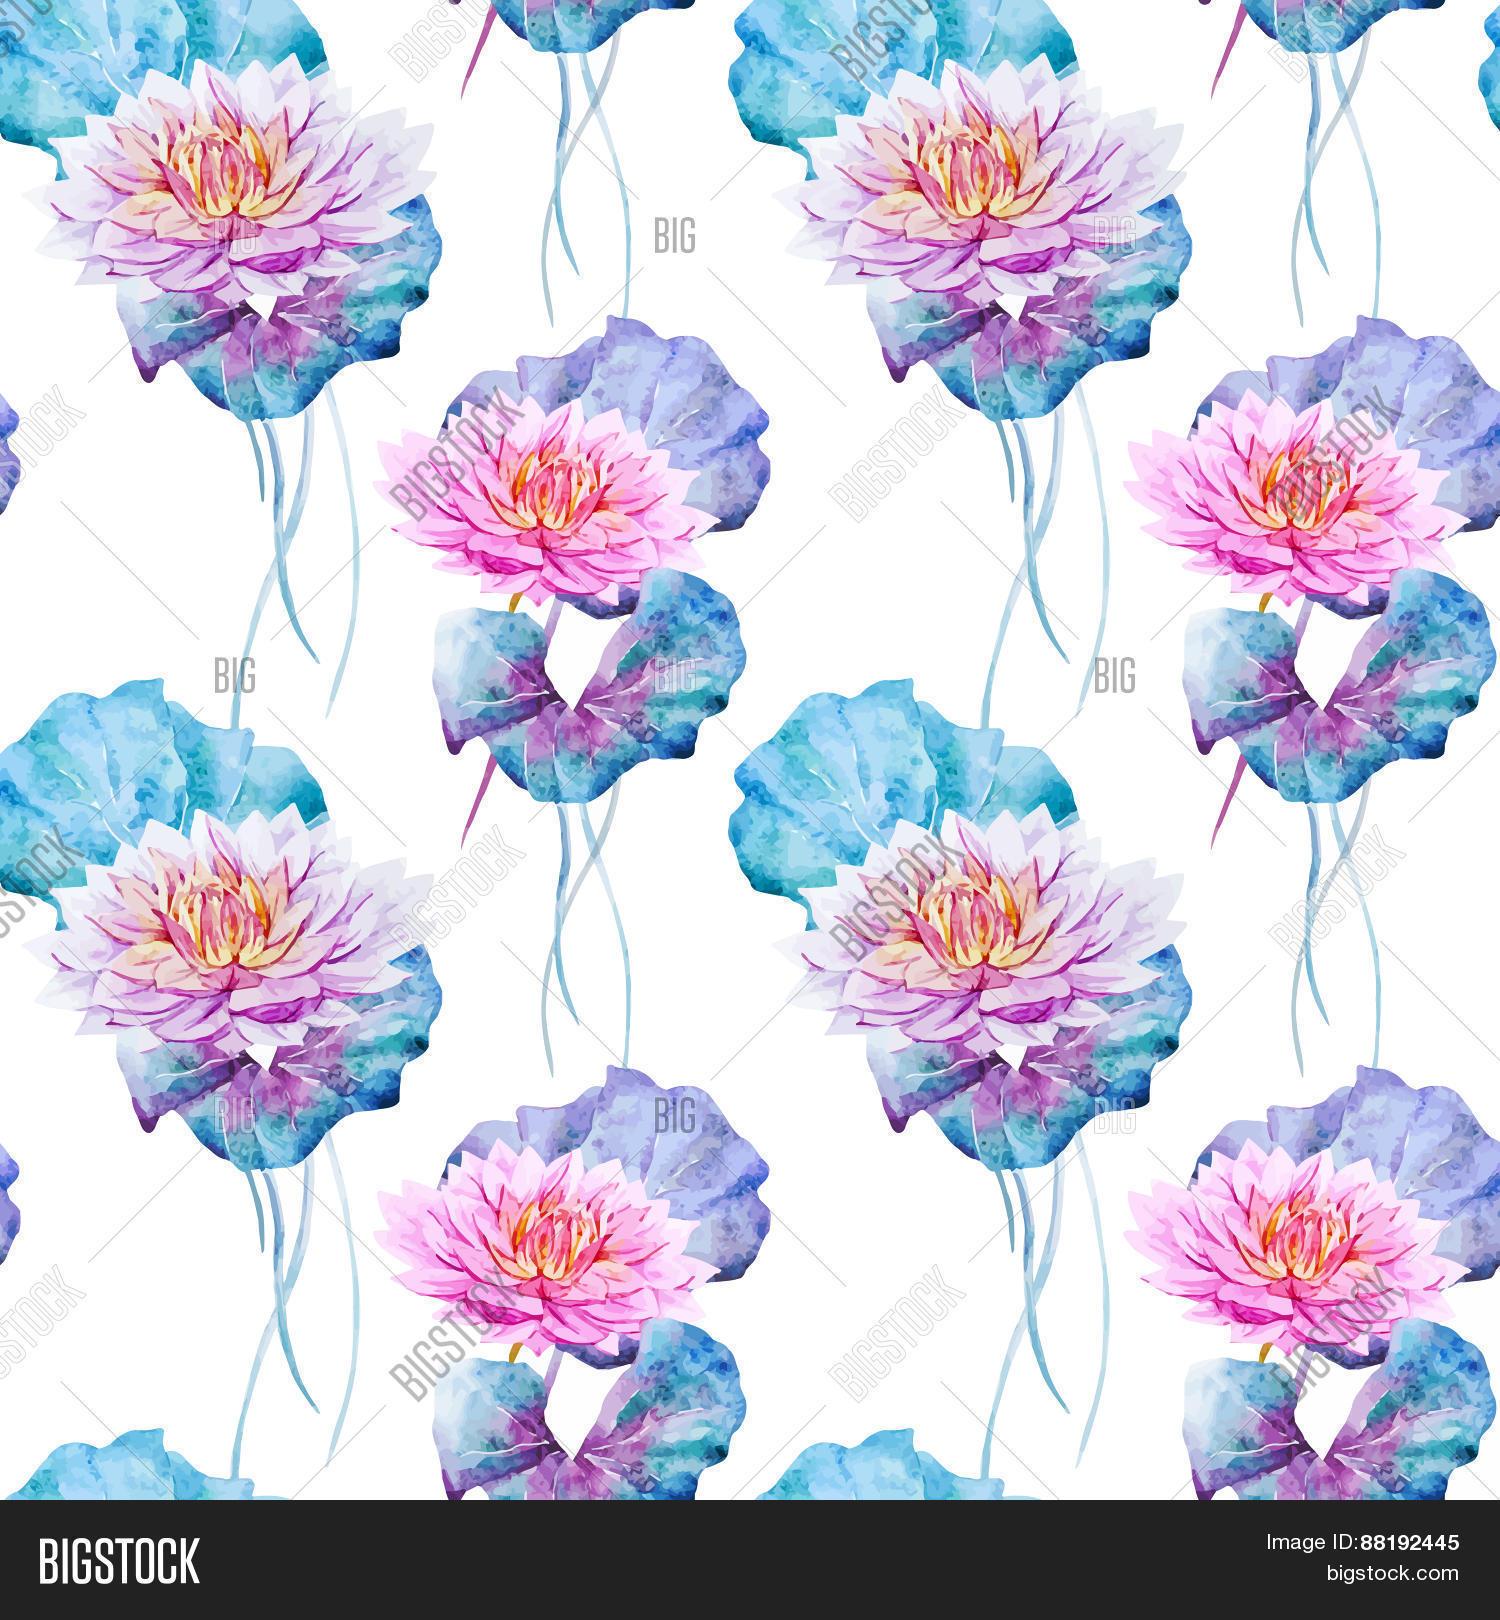 Lotus flowers pattern vector photo free trial bigstock lotus flowers pattern izmirmasajfo